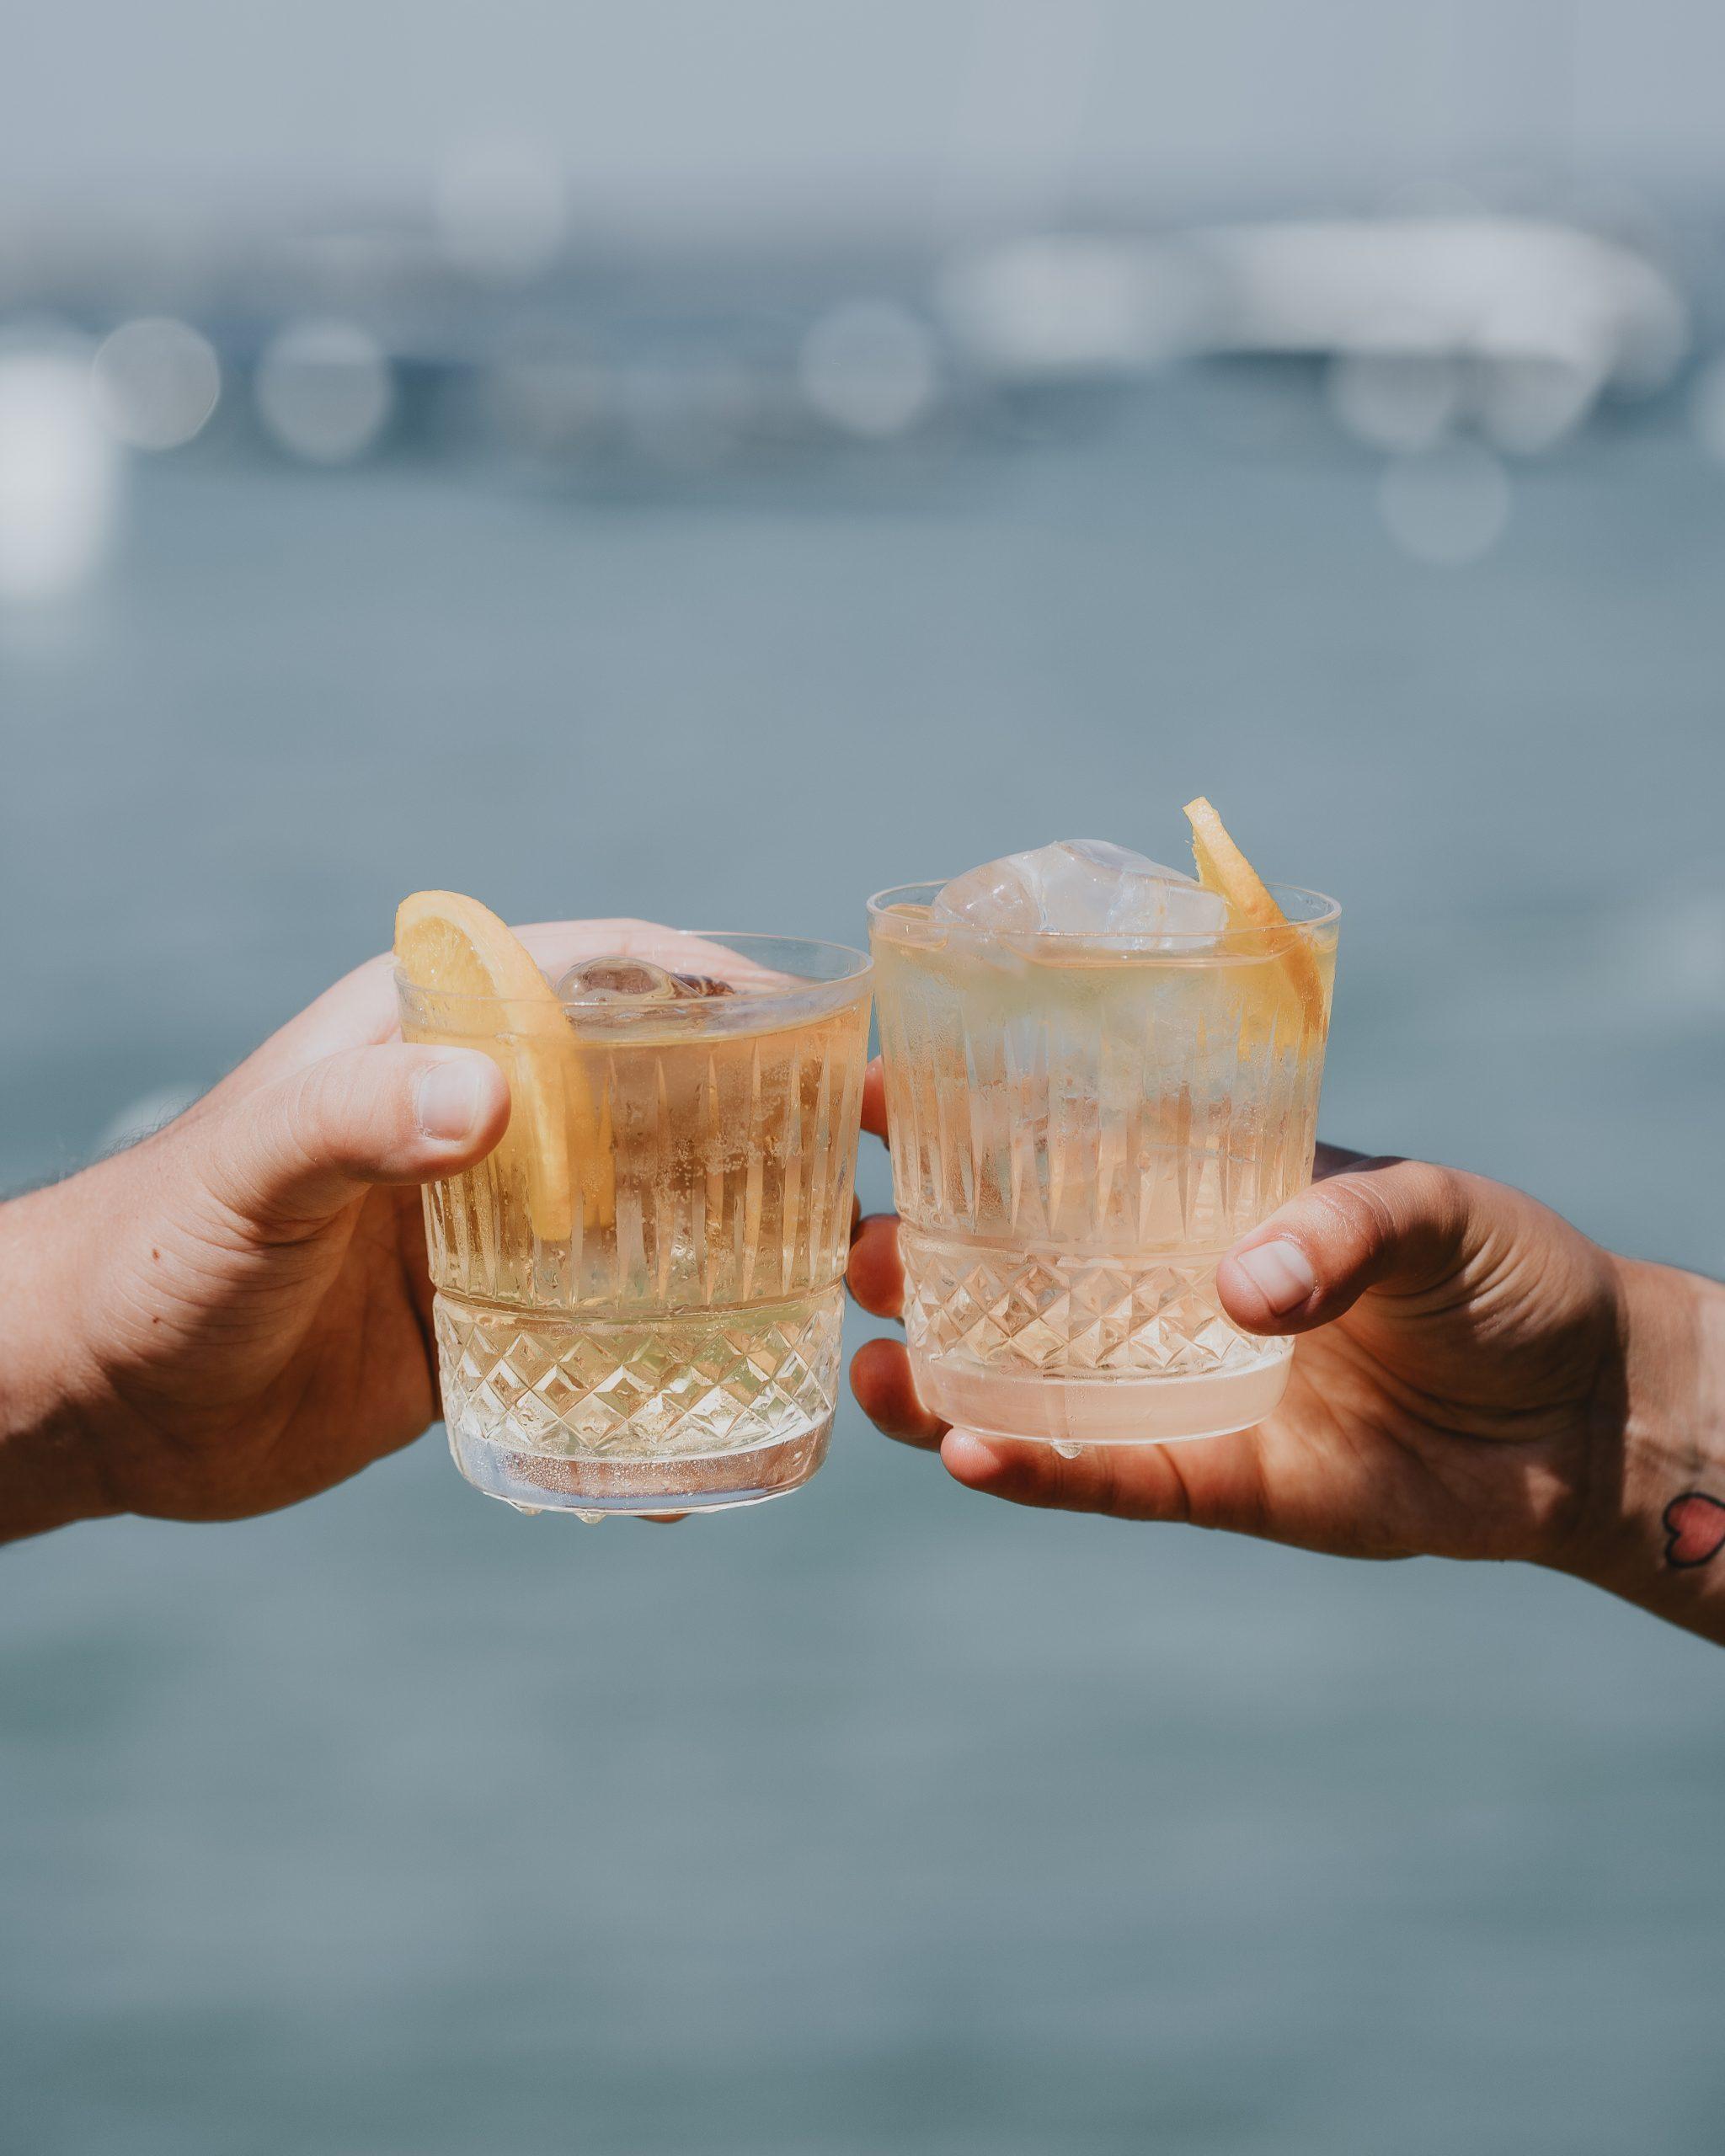 Enjoying rum together!